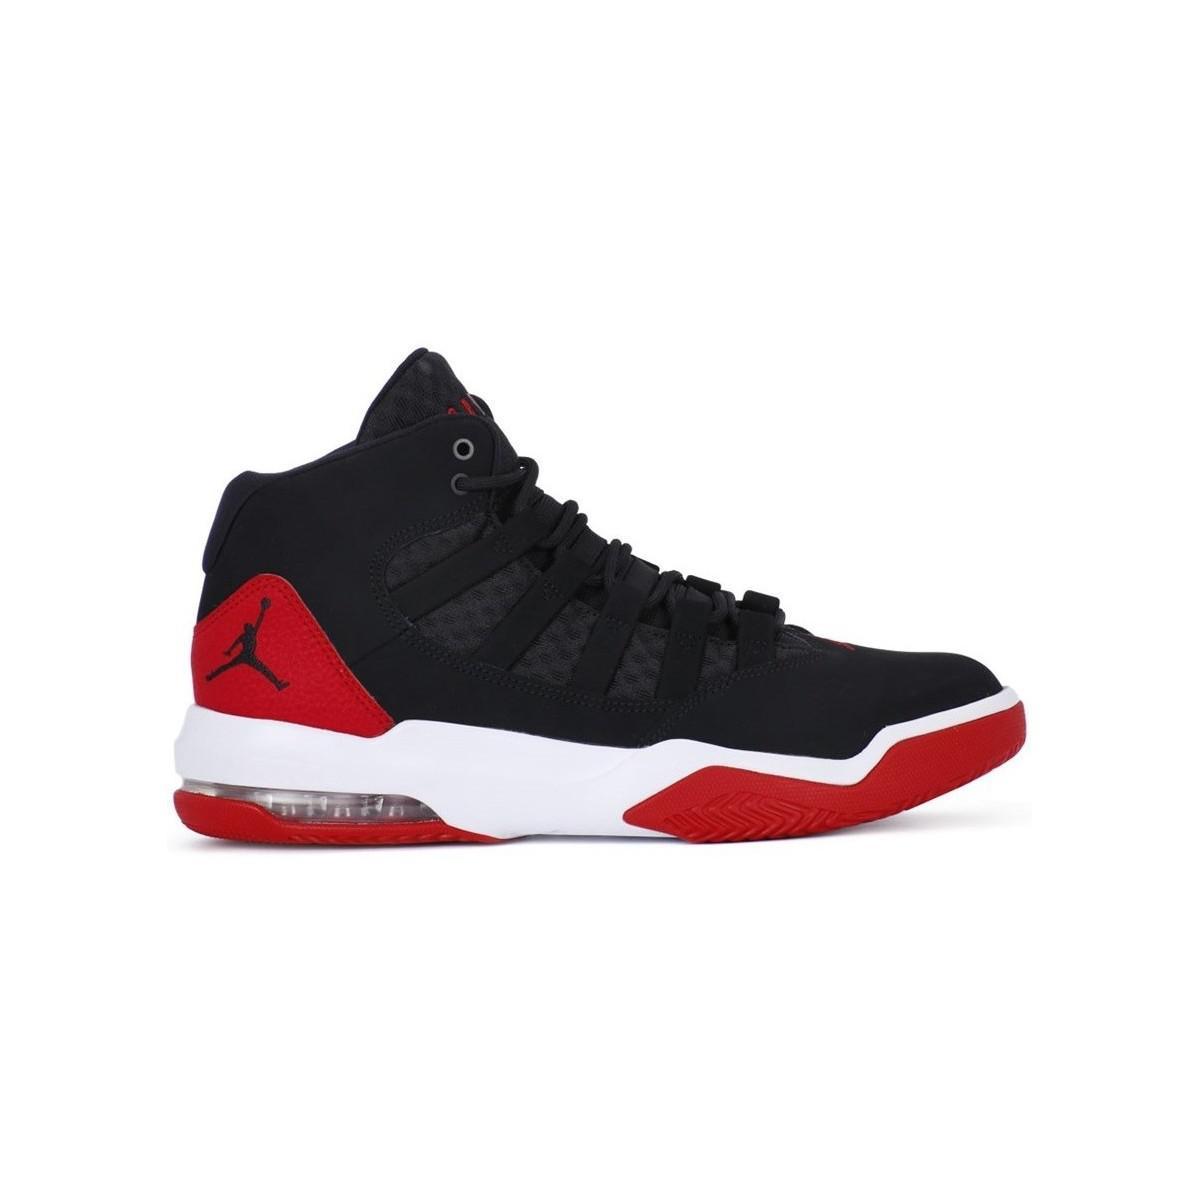 f3355a4e78a660 Nike Jordan Max Aura Men s Shoes (high-top Trainers) In Black in ...